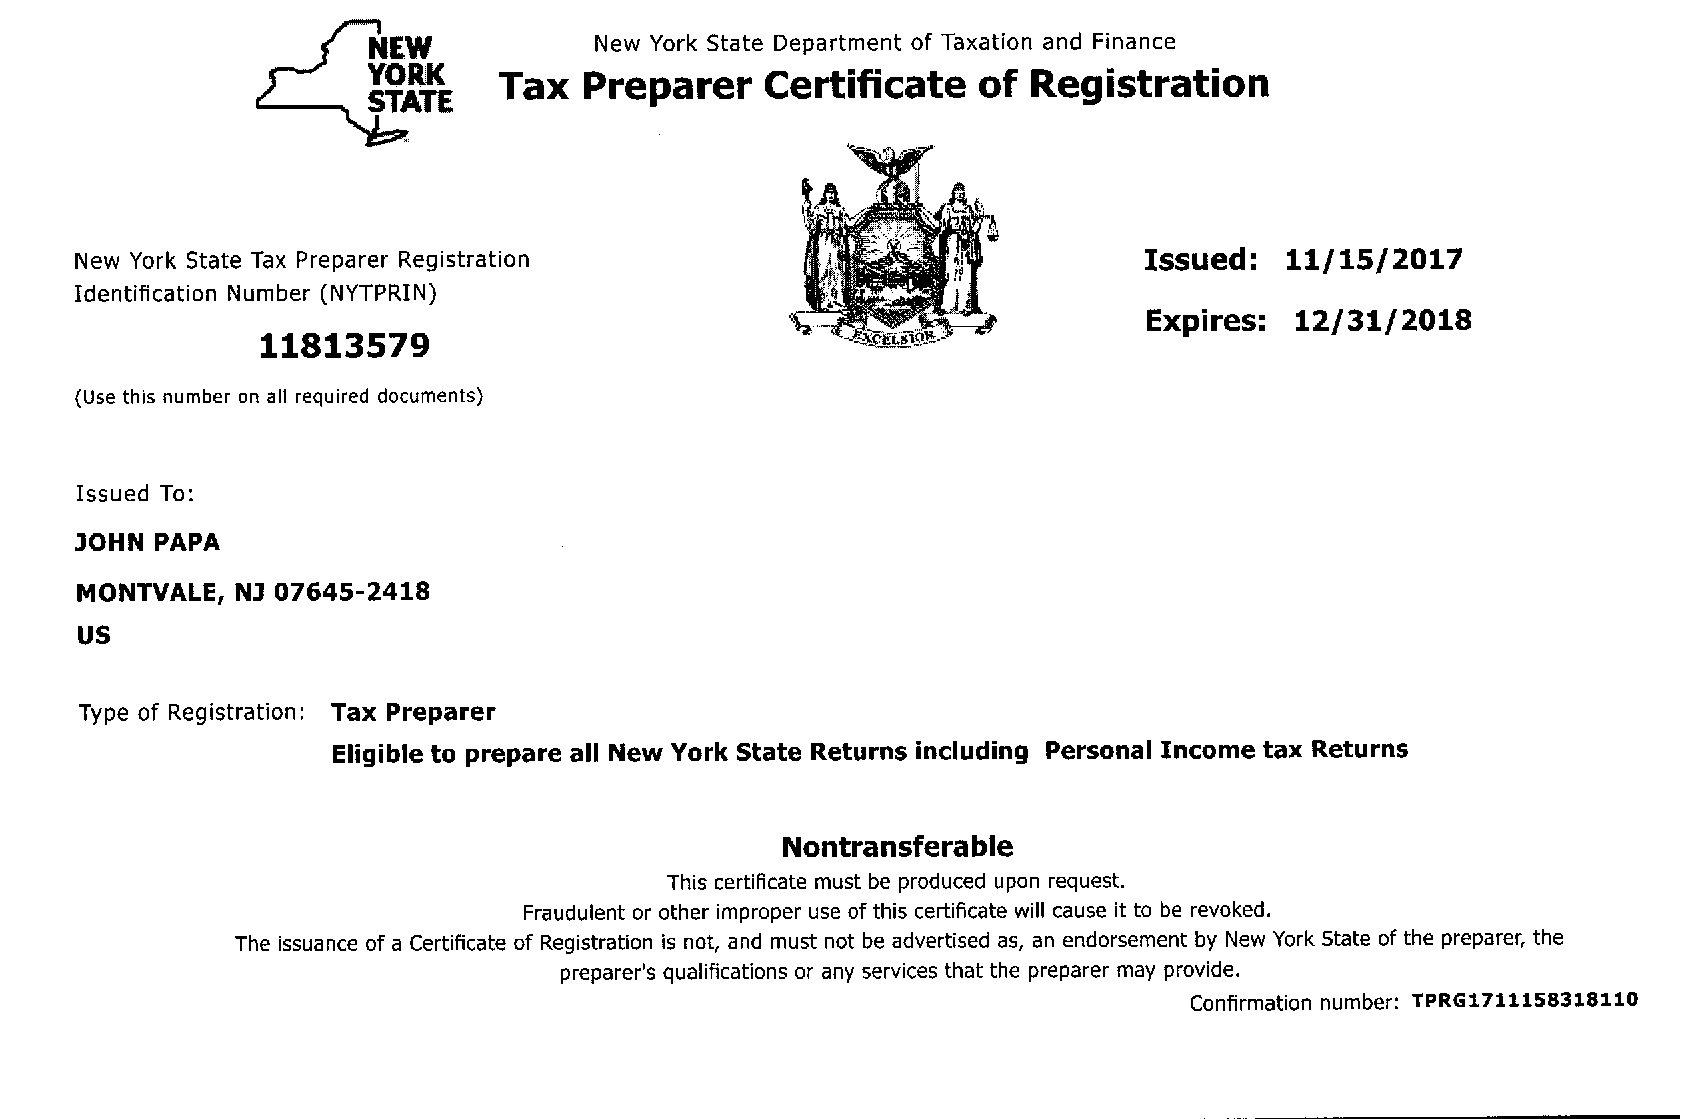 Papa Income Tax Preparation Mission Statement